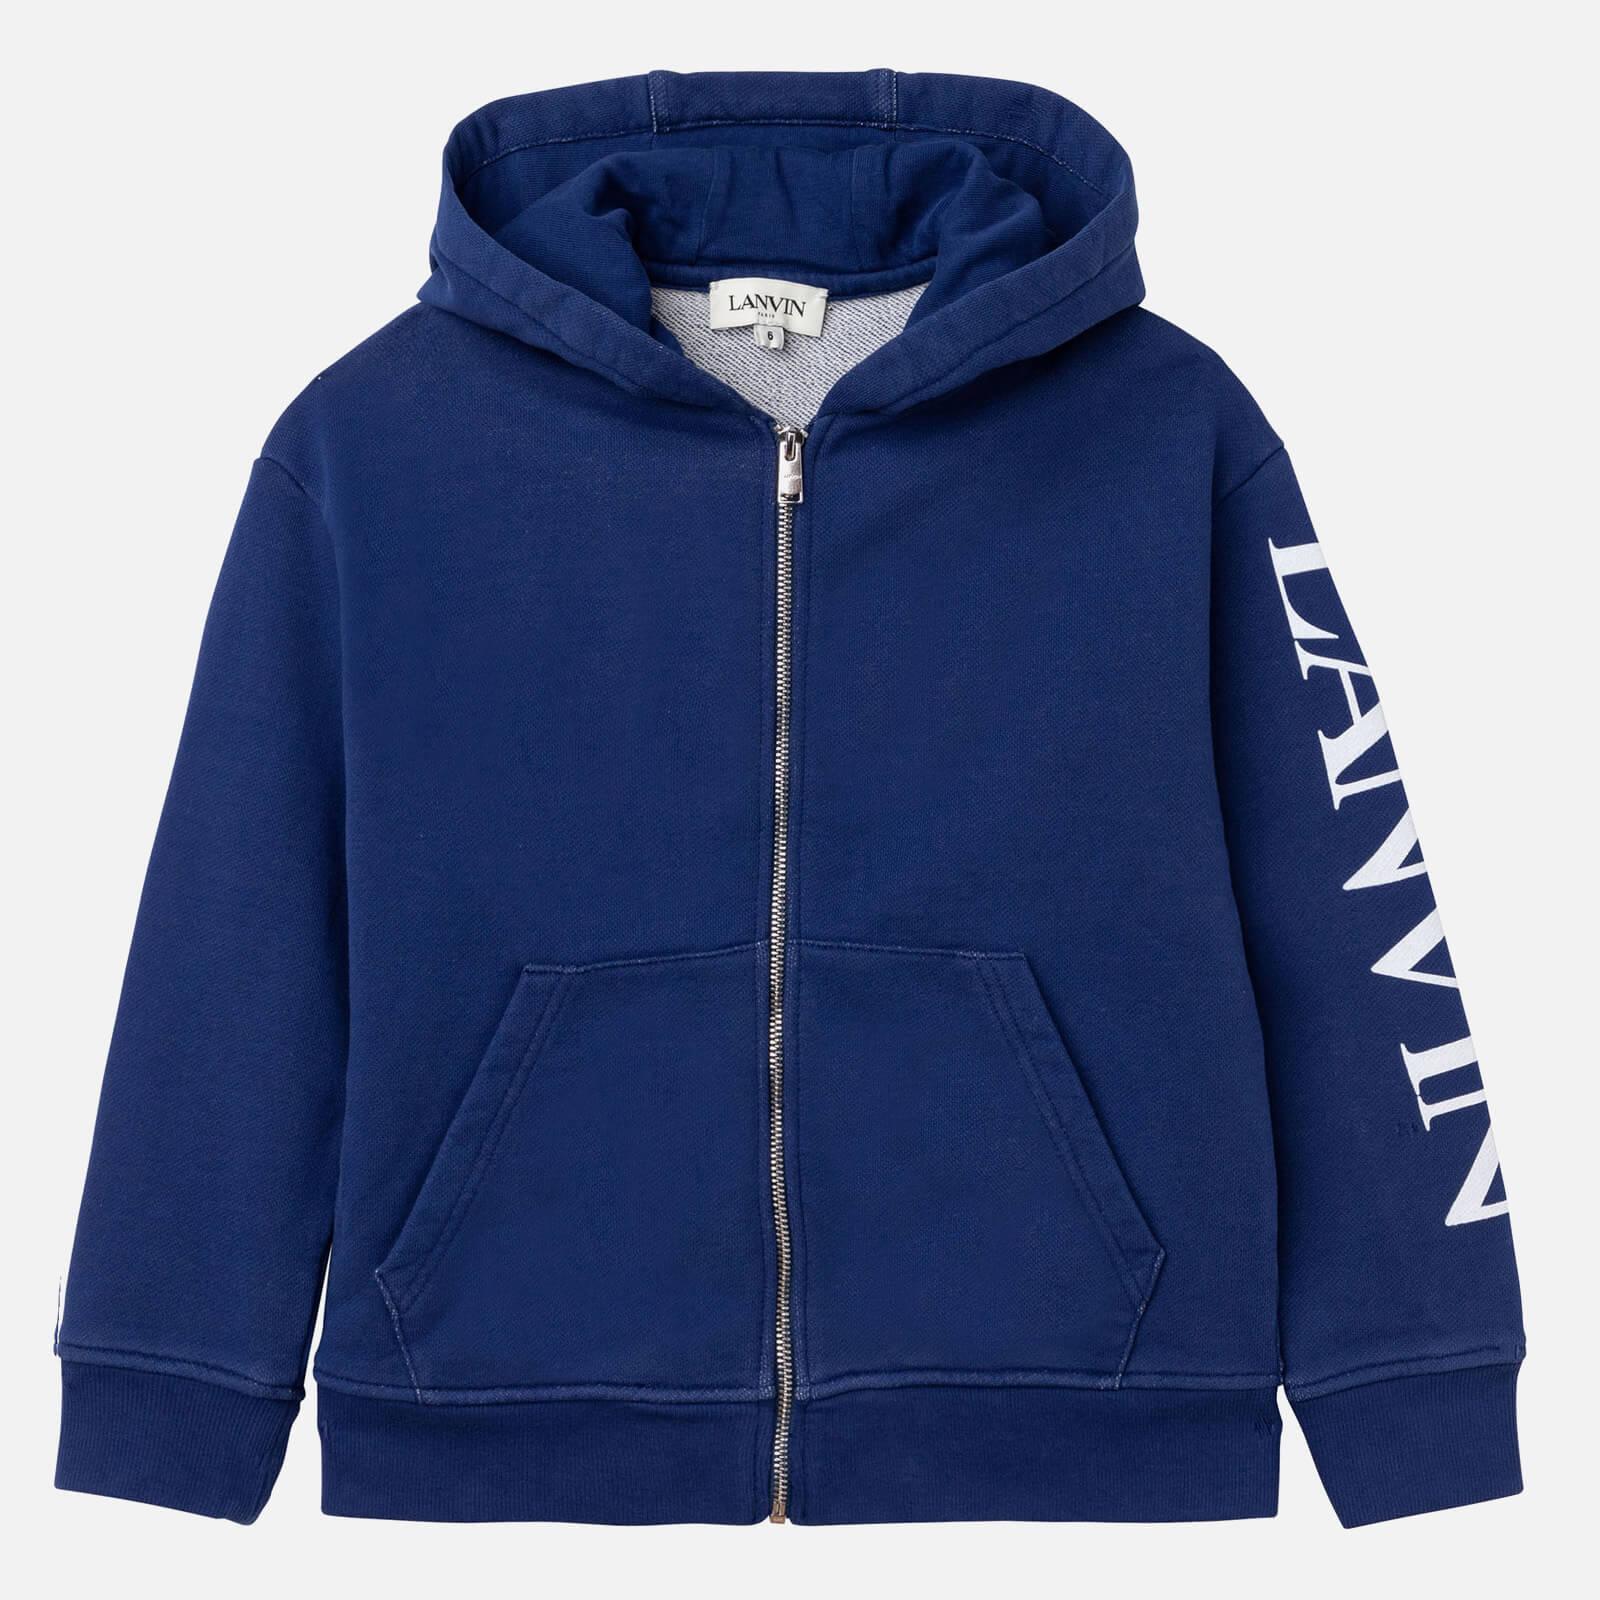 Lanvin Boys' Hooded Zip Cardigan - Denim Blue - 5 Years